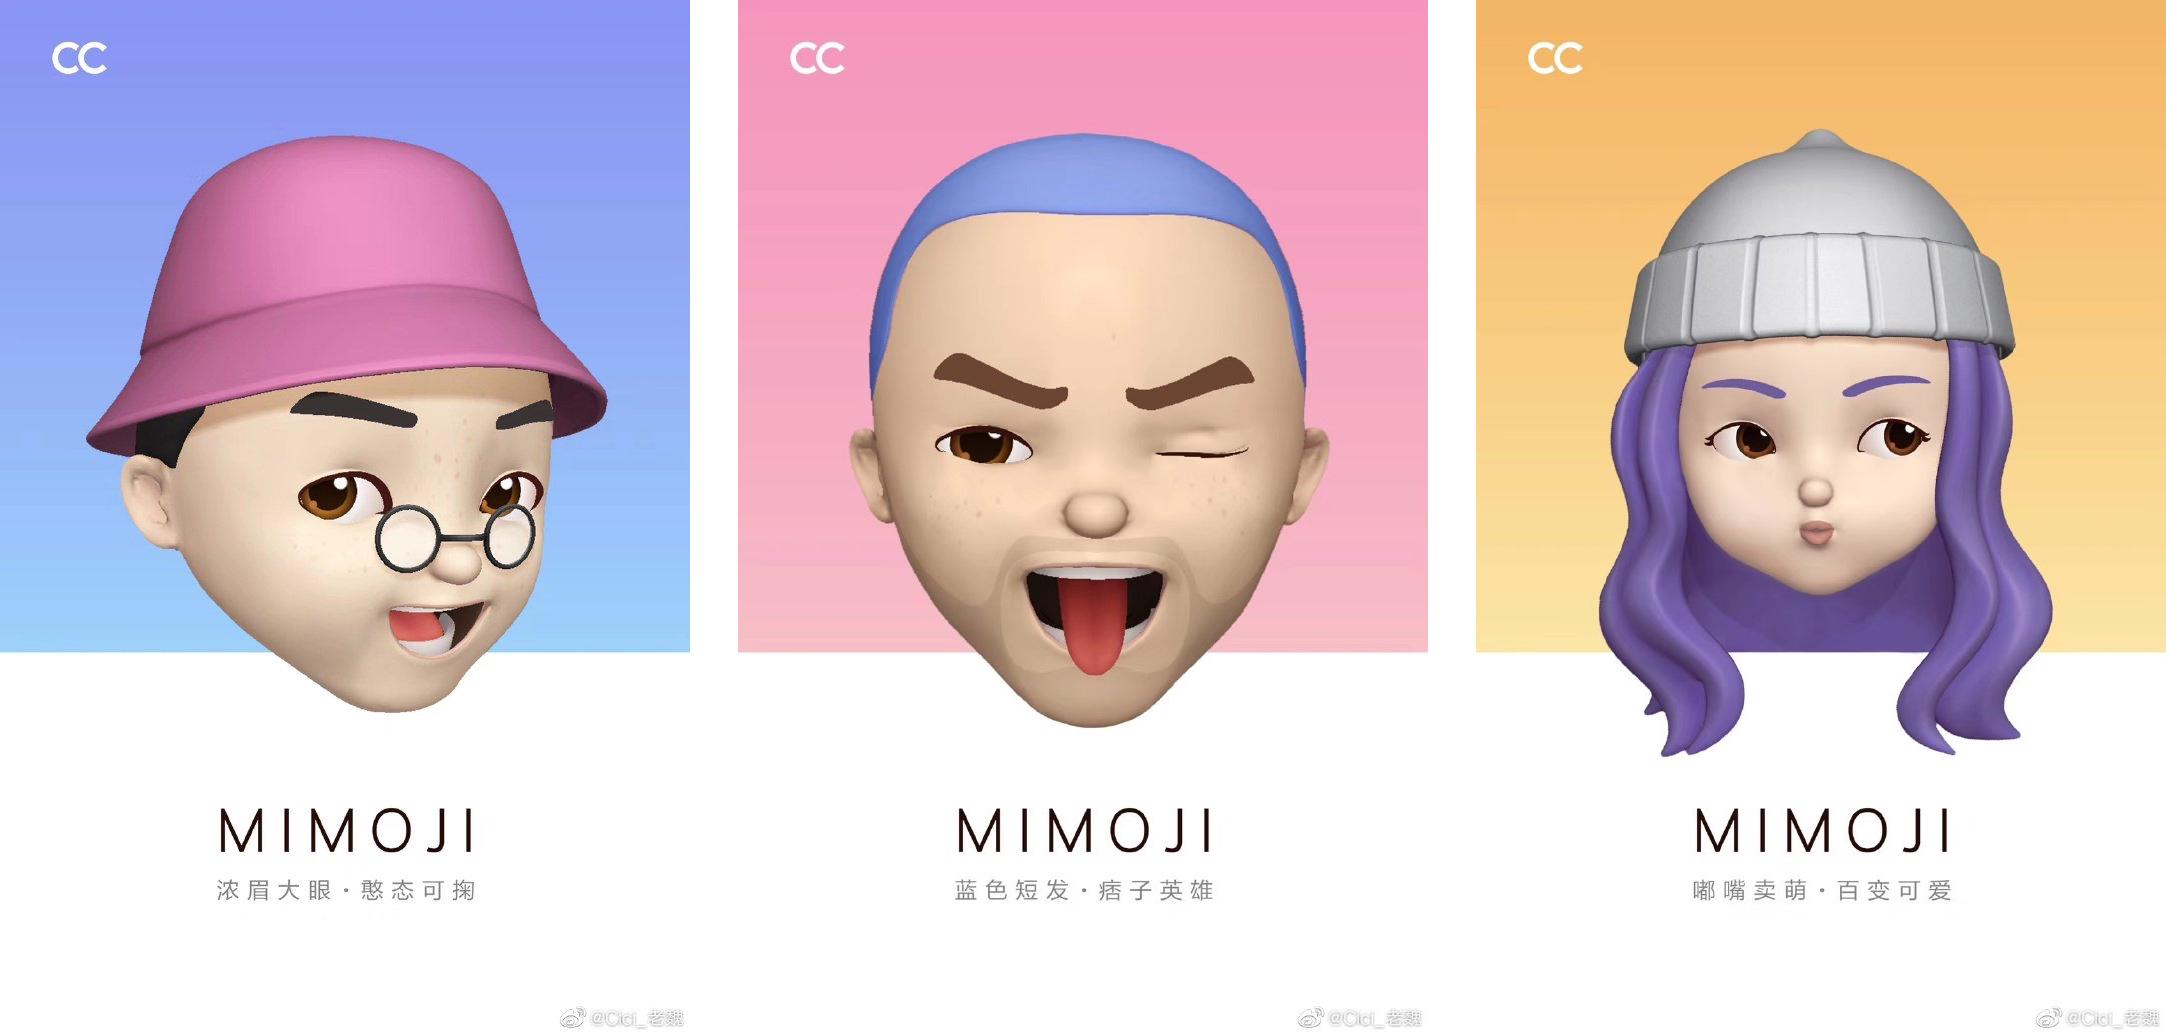 Mimojis